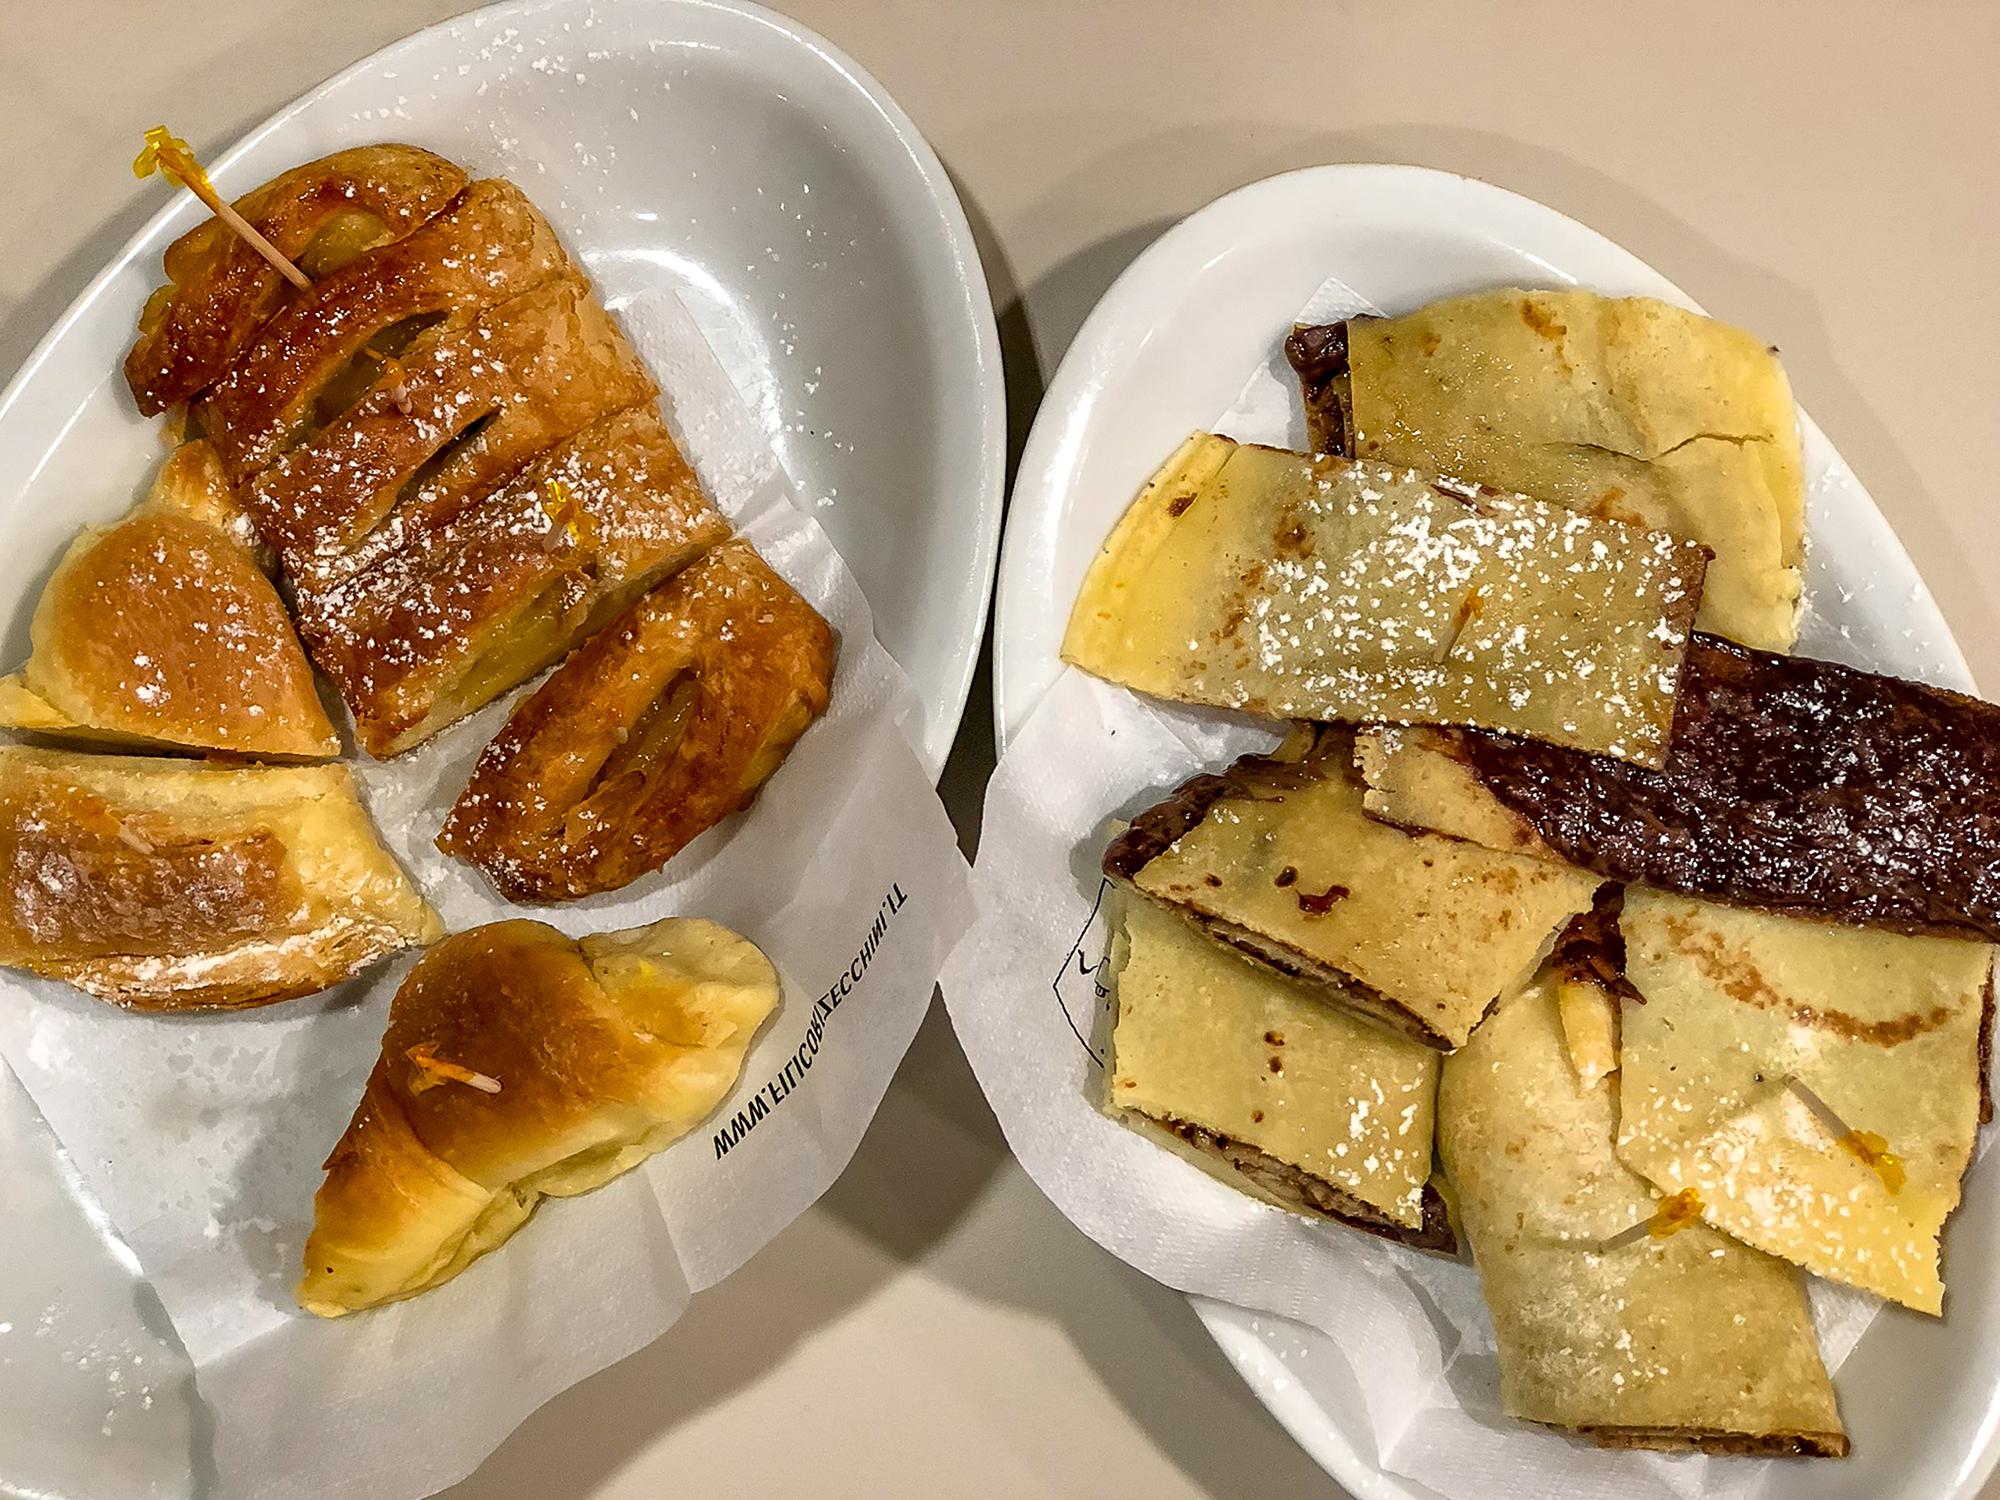 Desserts on white plates